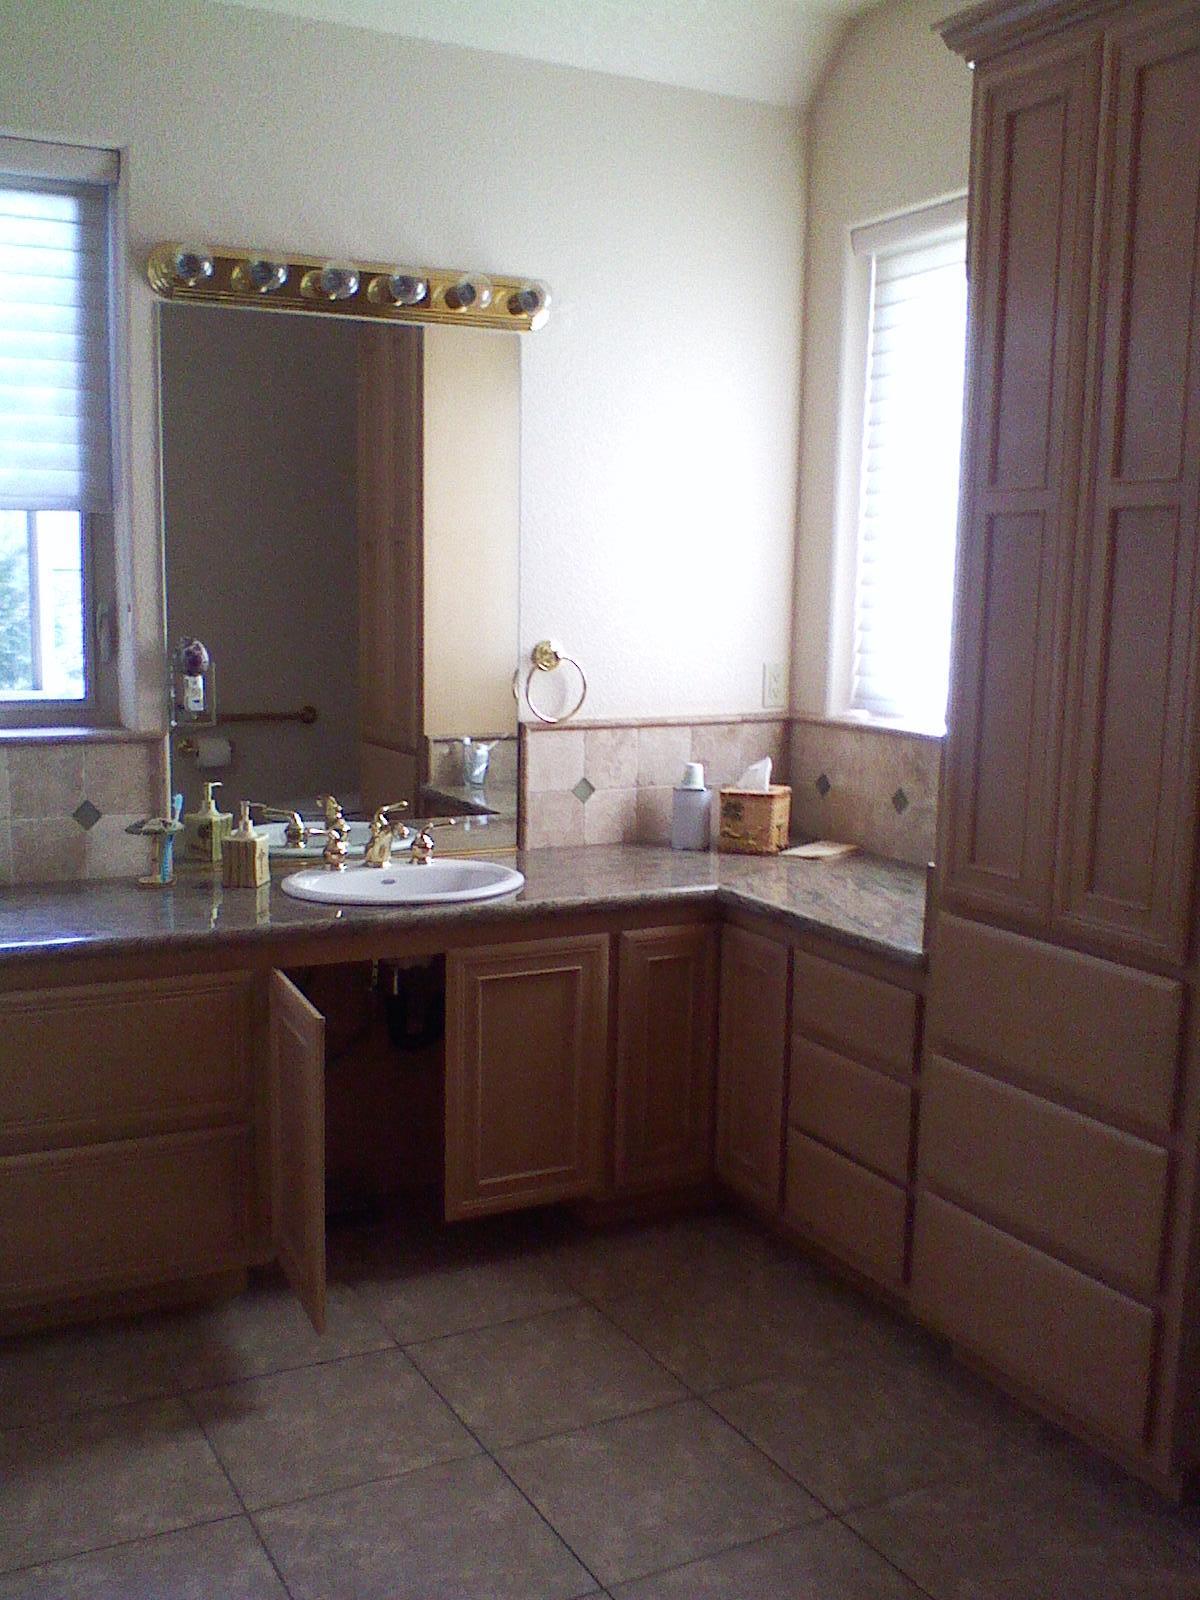 One Kitchen And Bath